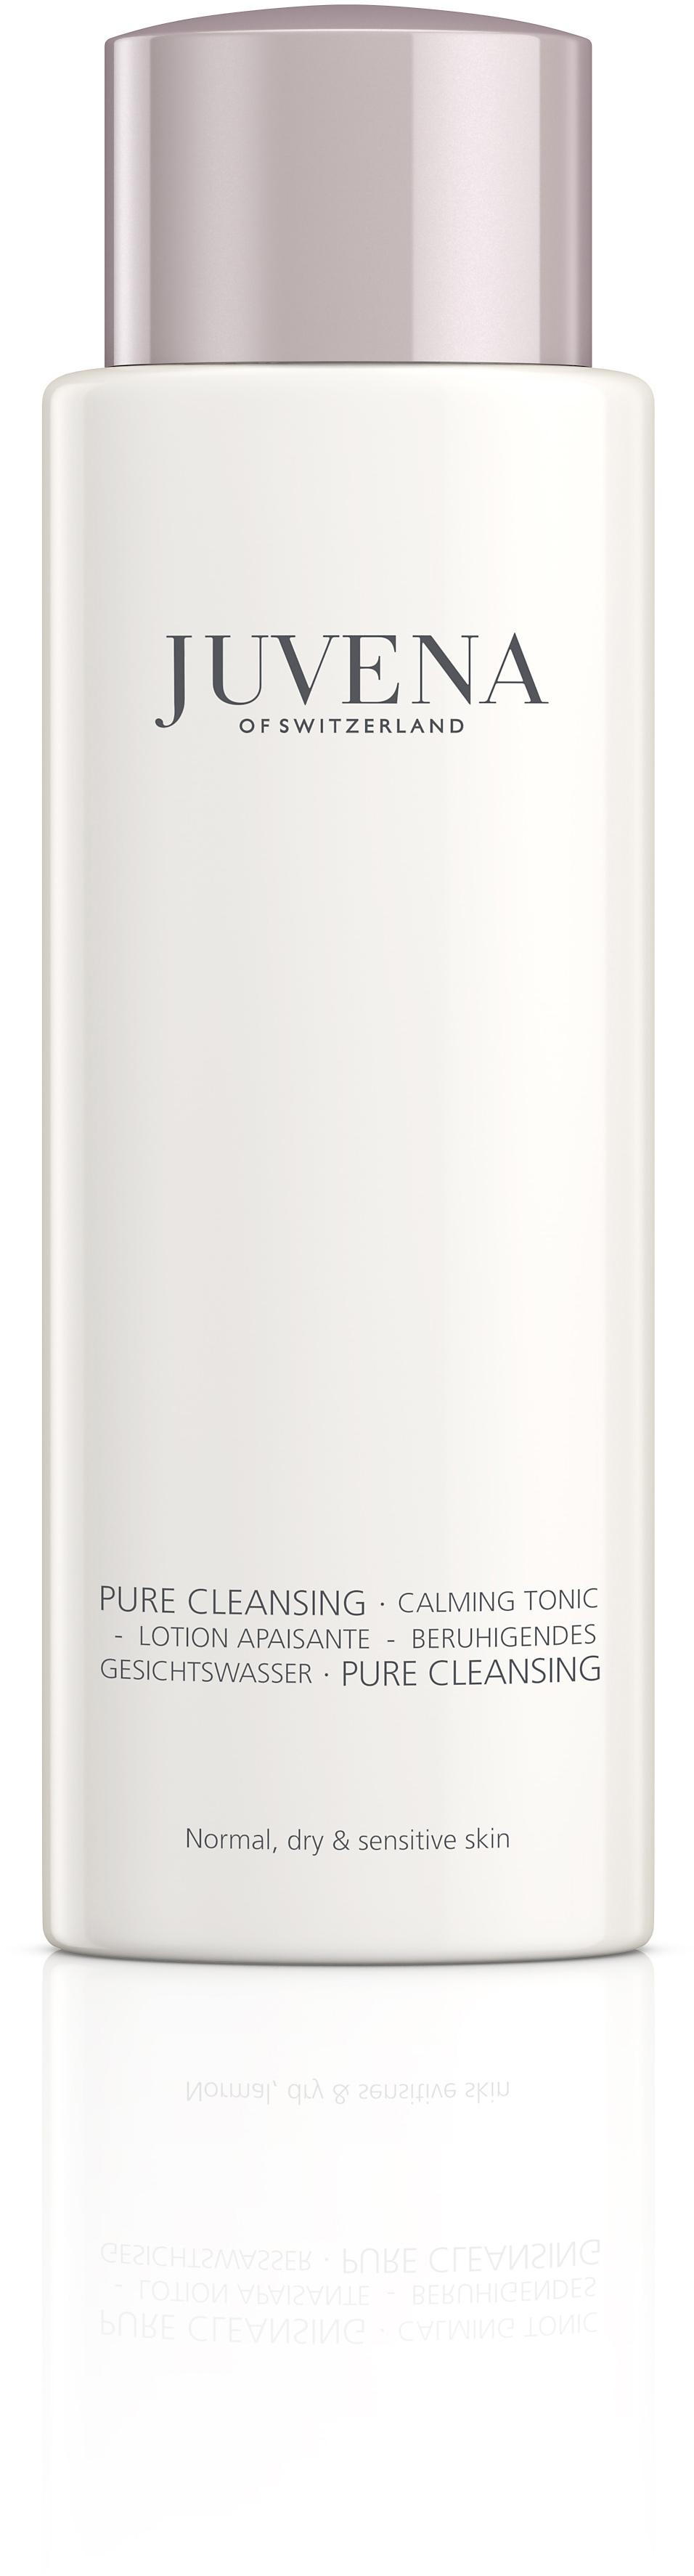 Juvena Pure Calming Tonic 200 ml